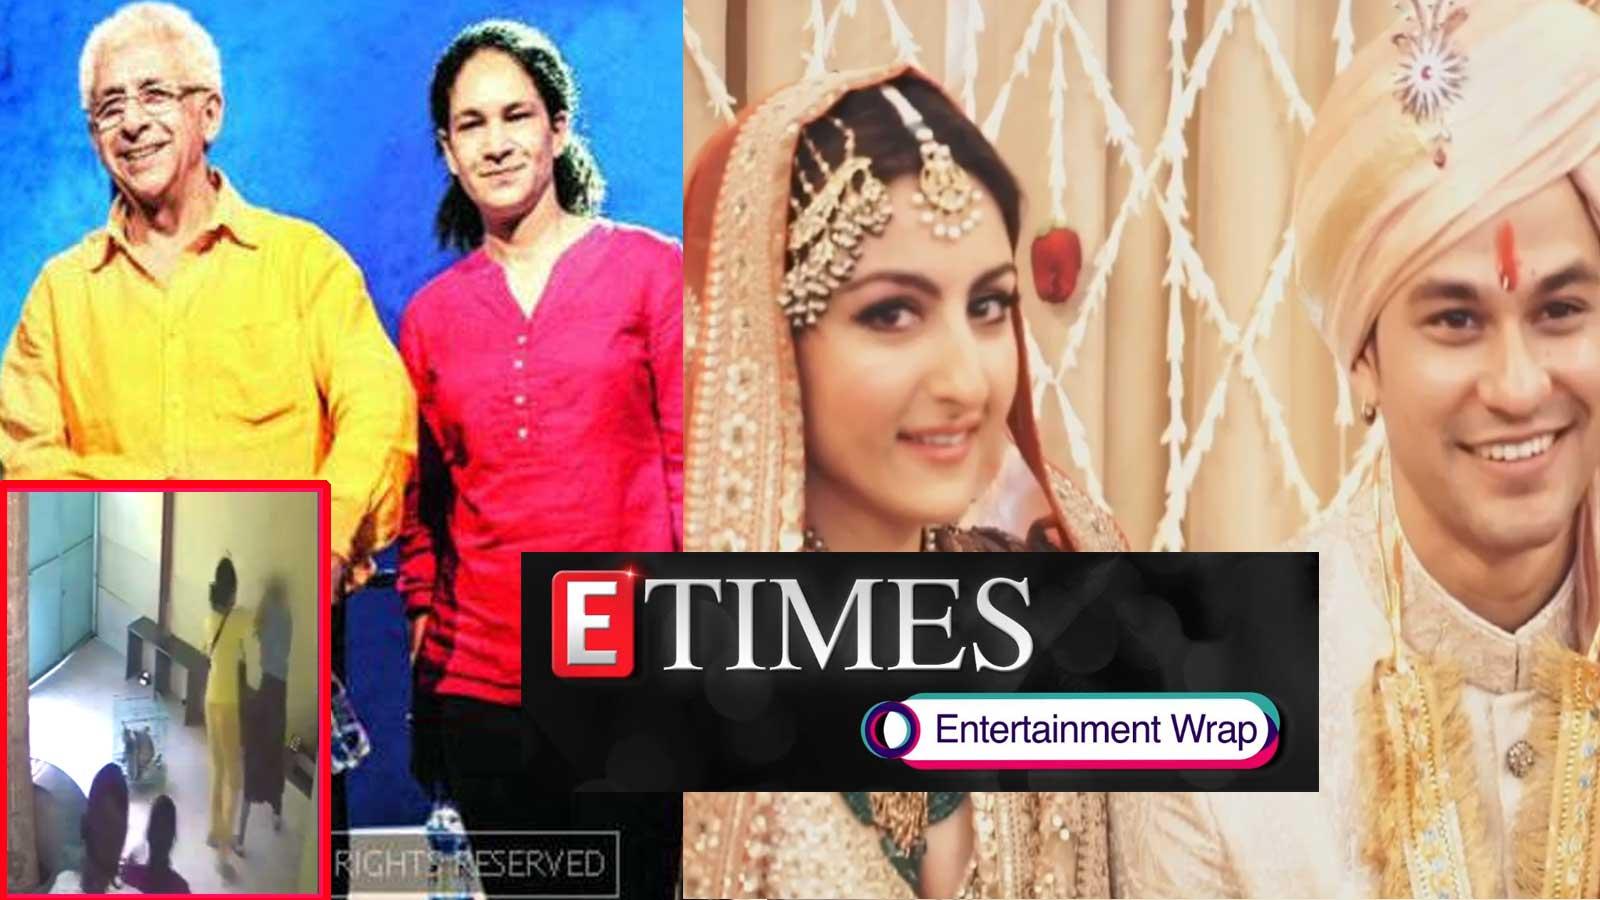 naseeruddin-shahs-daughter-heeba-shah-assaults-2-female-vet-clinic-staff-soha-ali-khan-kunal-kemmu-celebrate-5th-wedding-anniversary-and-more